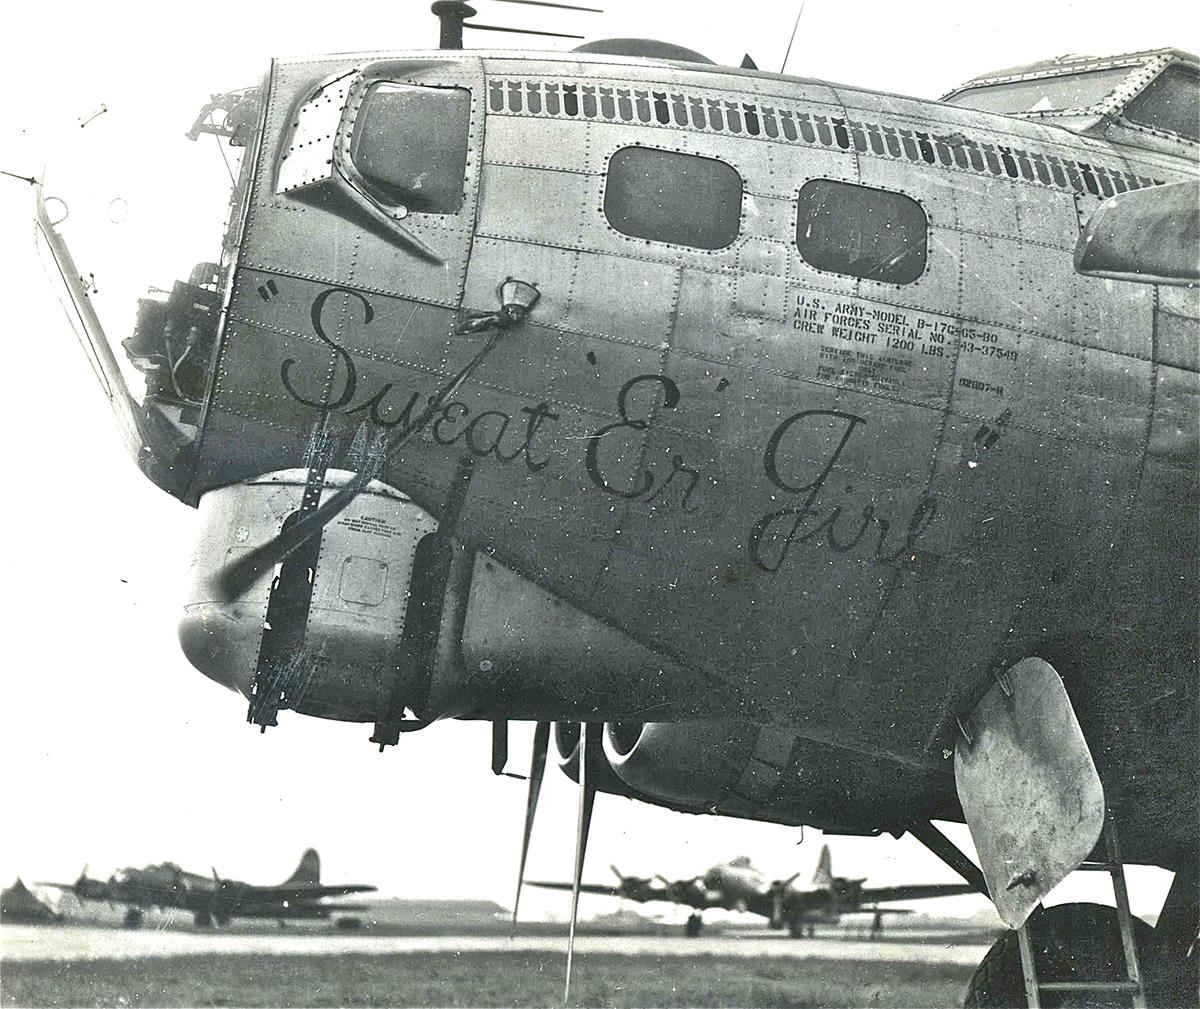 B-17 #43-37549 / Sweat'er Girl